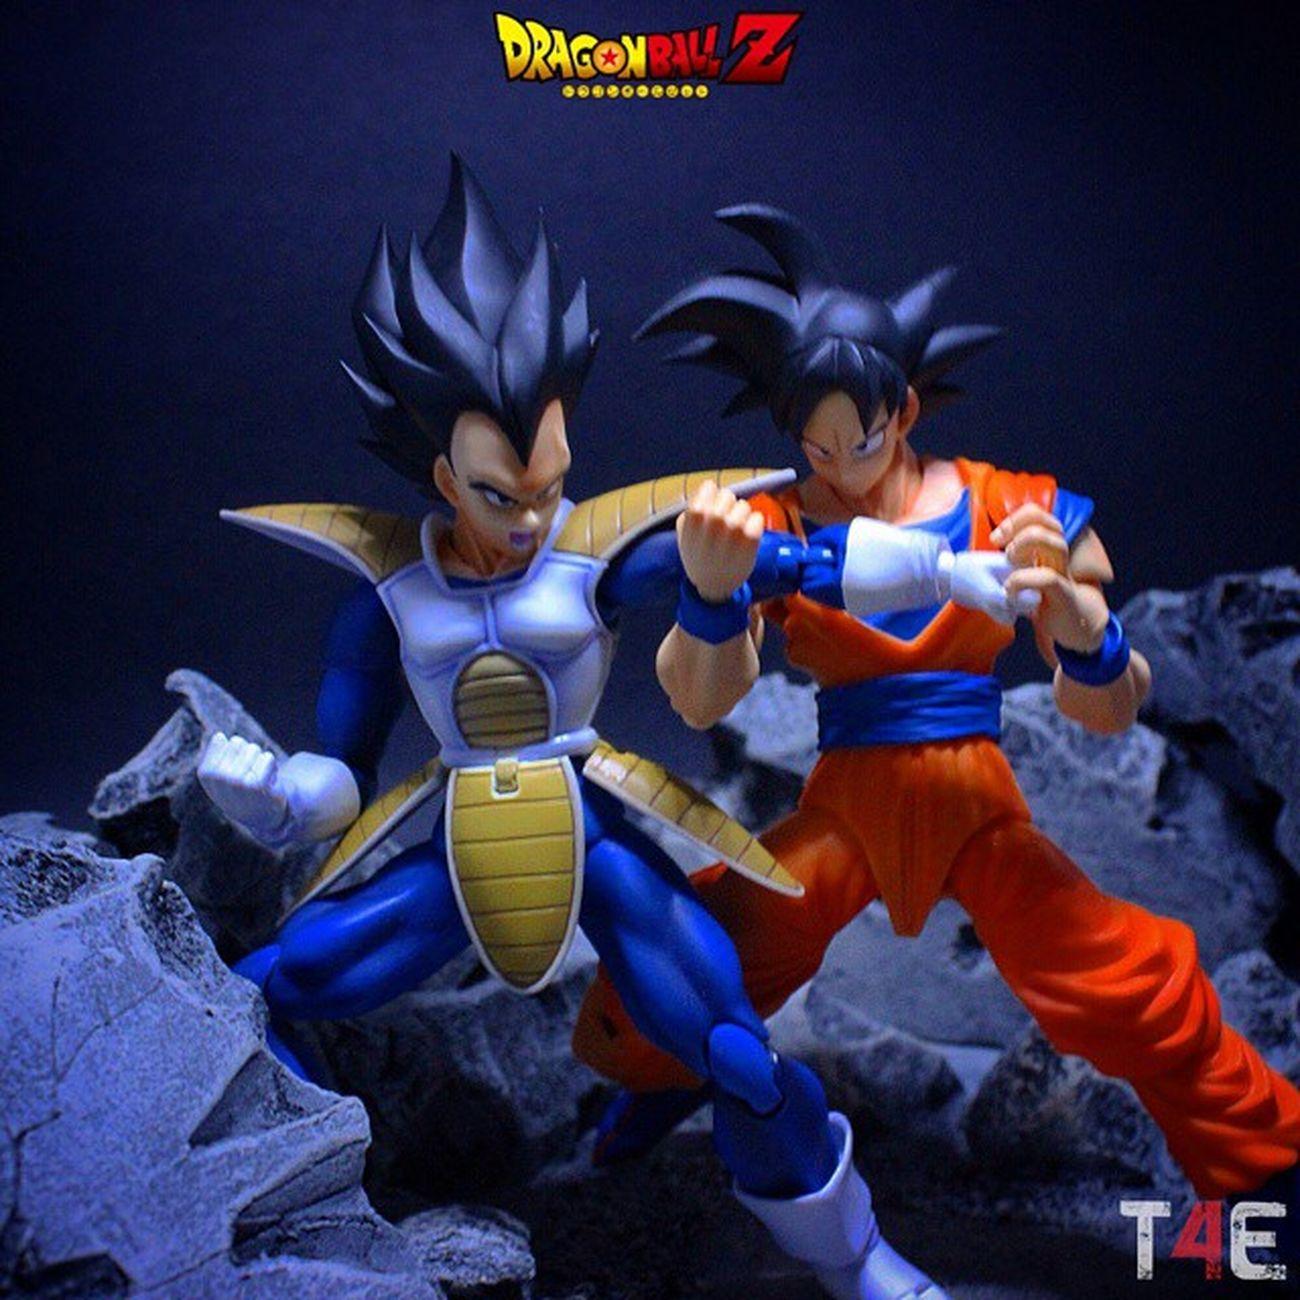 The battle begins! Goku vs Vegeta! Tcb_primal_fear